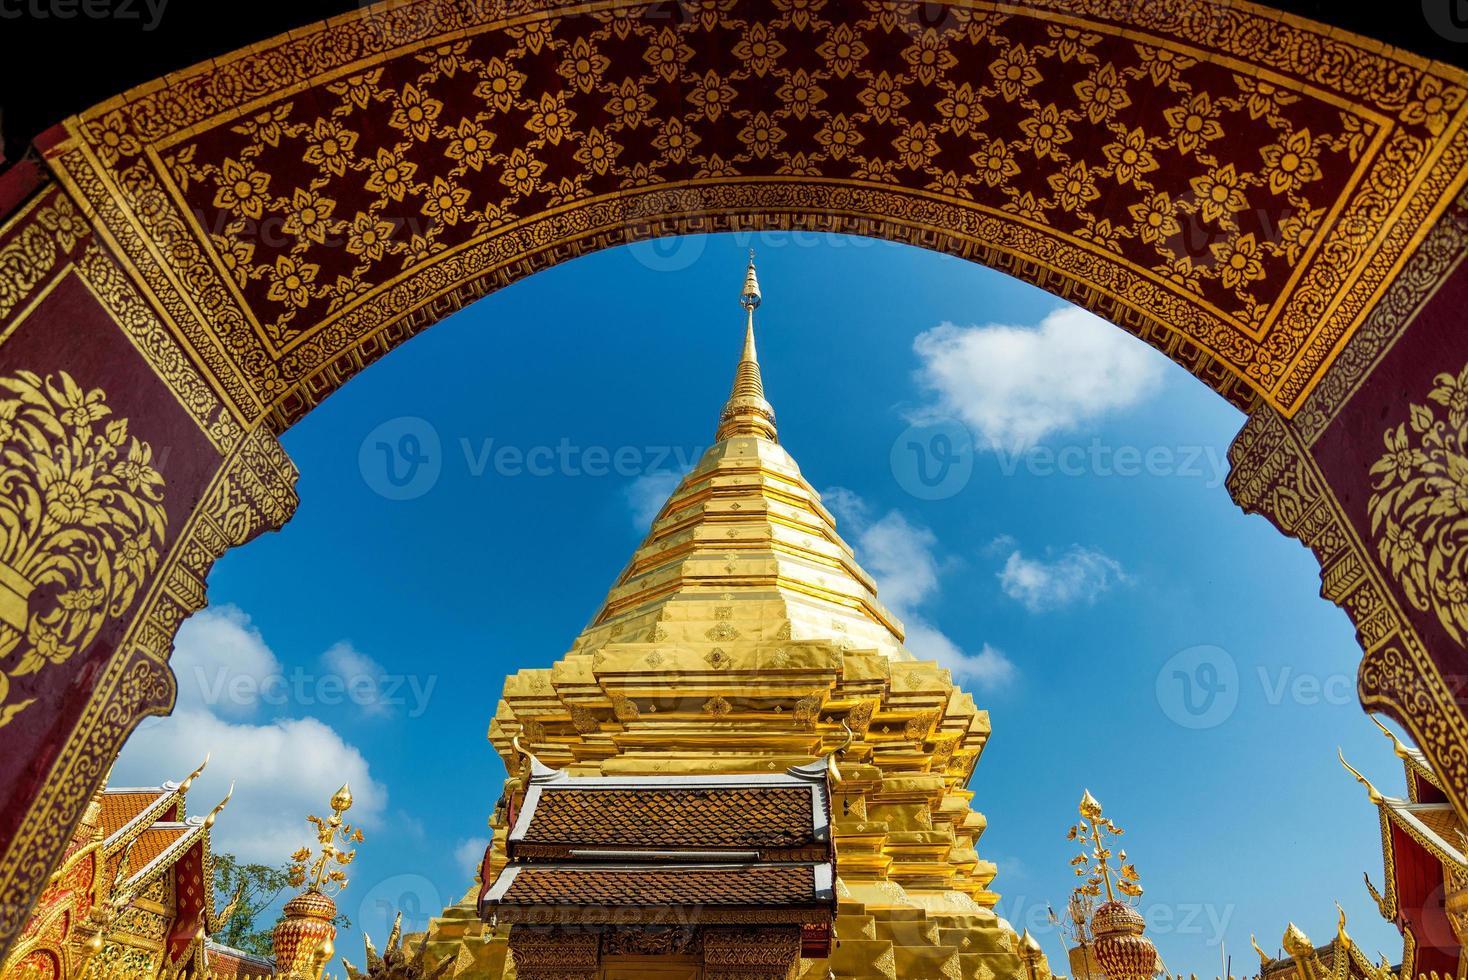 Wat Phra That Doi Suthep Temple à Chiang Mai, Thaïlande photo